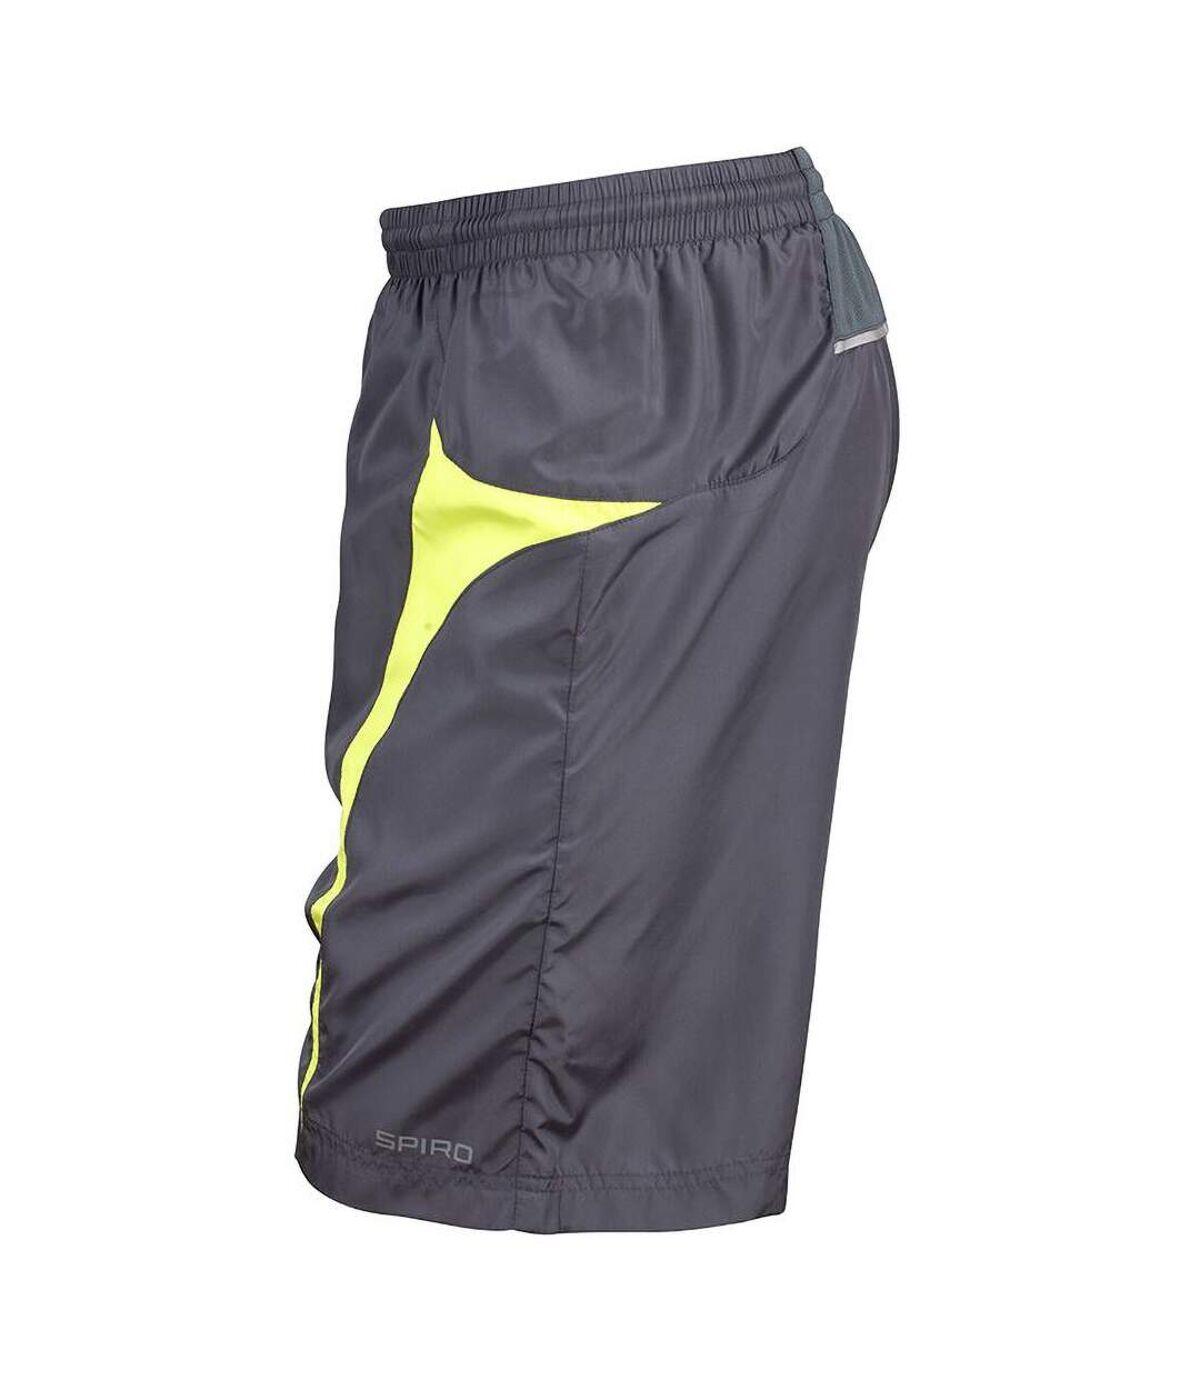 Spiro Mens Micro-Team Sports Shorts (Grey/Lime) - UTRW1478